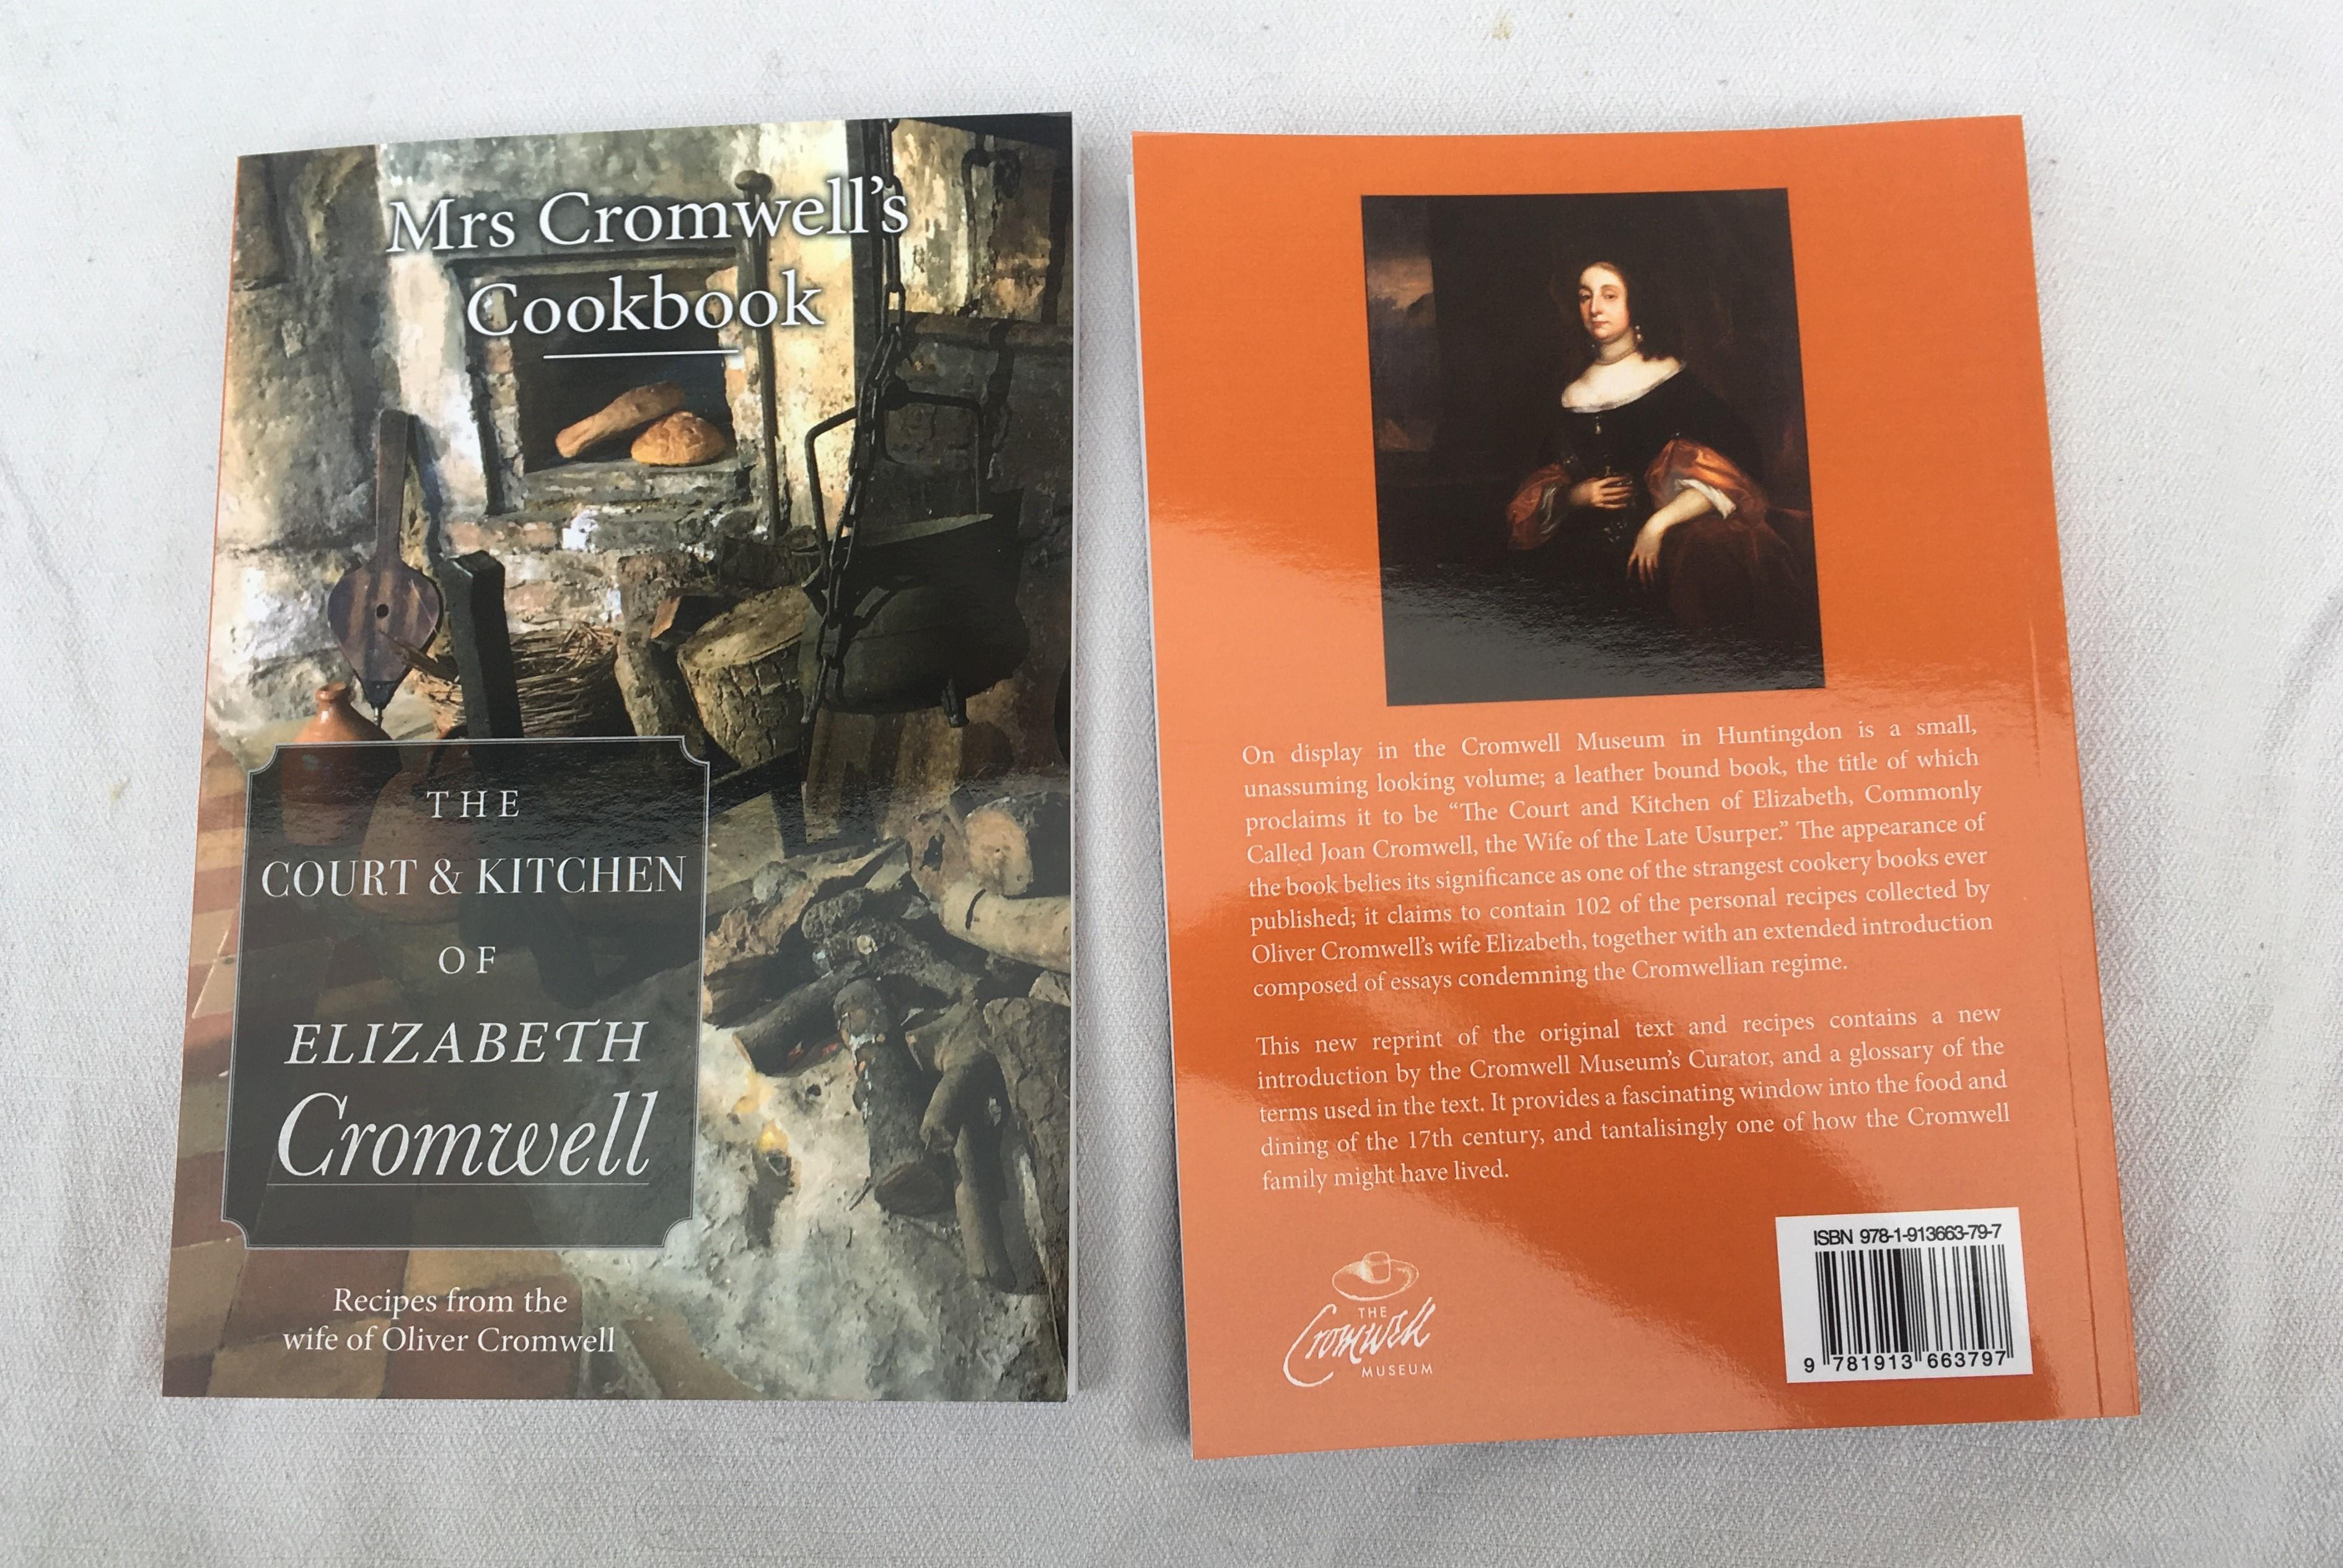 Book: Mrs Cromwell's Cookbook (SKU: BK-FA-037)